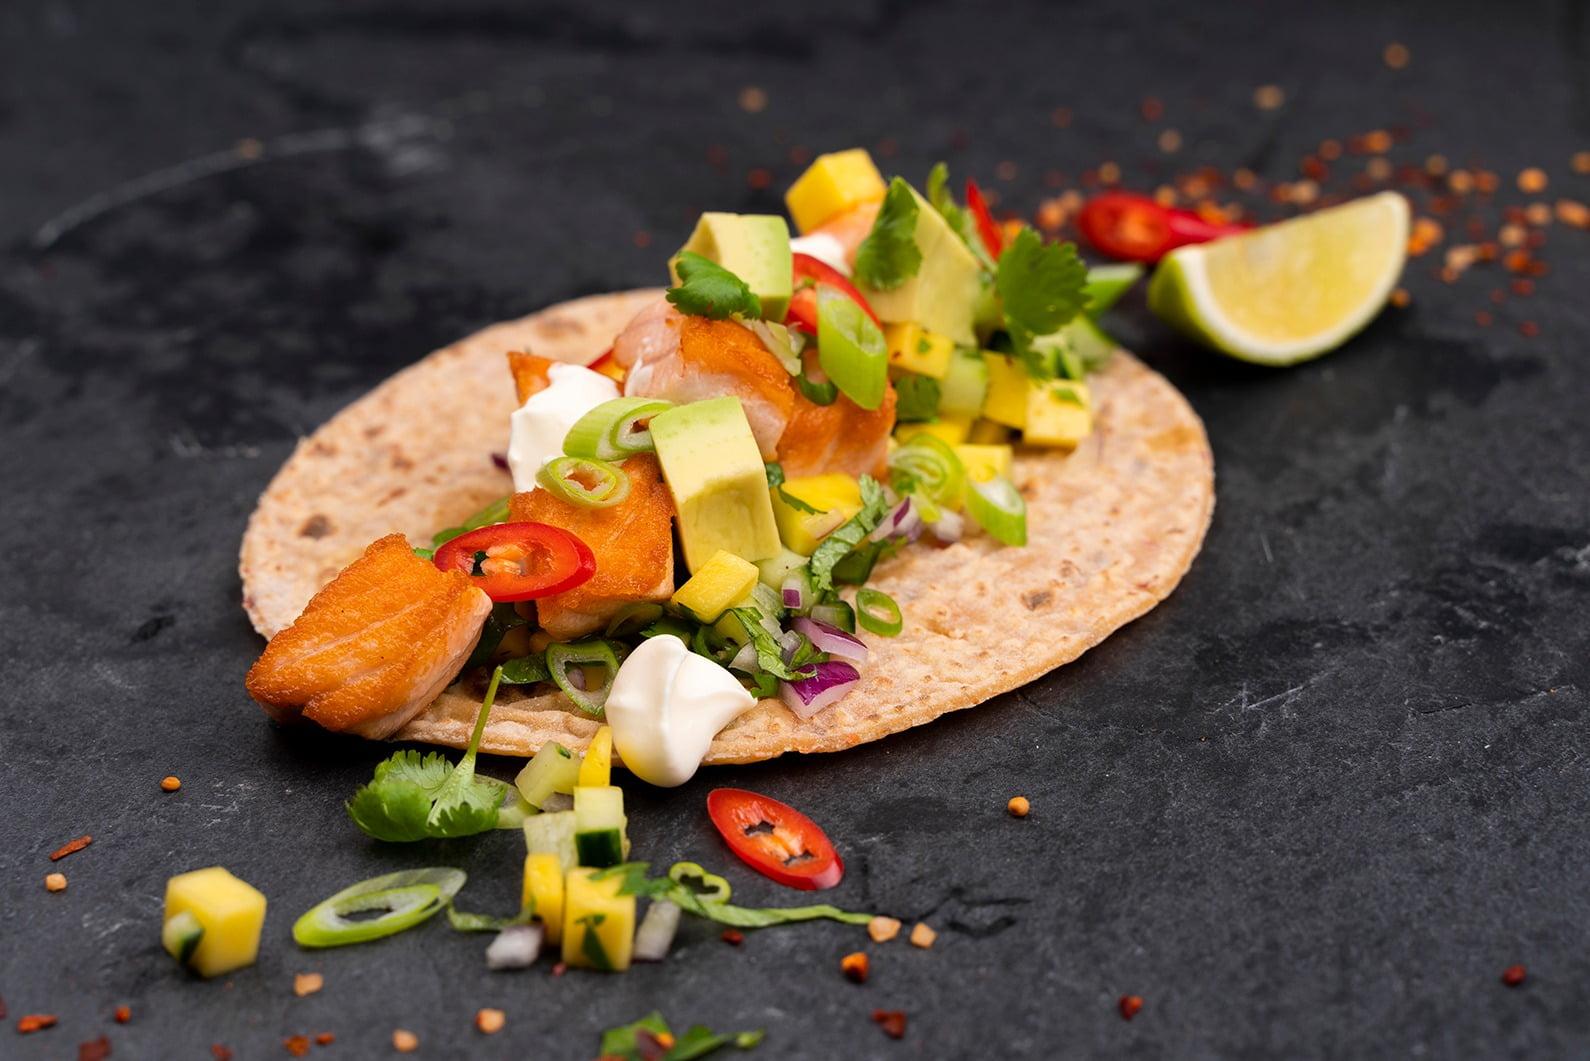 Leaf vegetable, Food, Plant, Ingredient, Recipe, Rangpur, Fruit, Cuisine, Dish